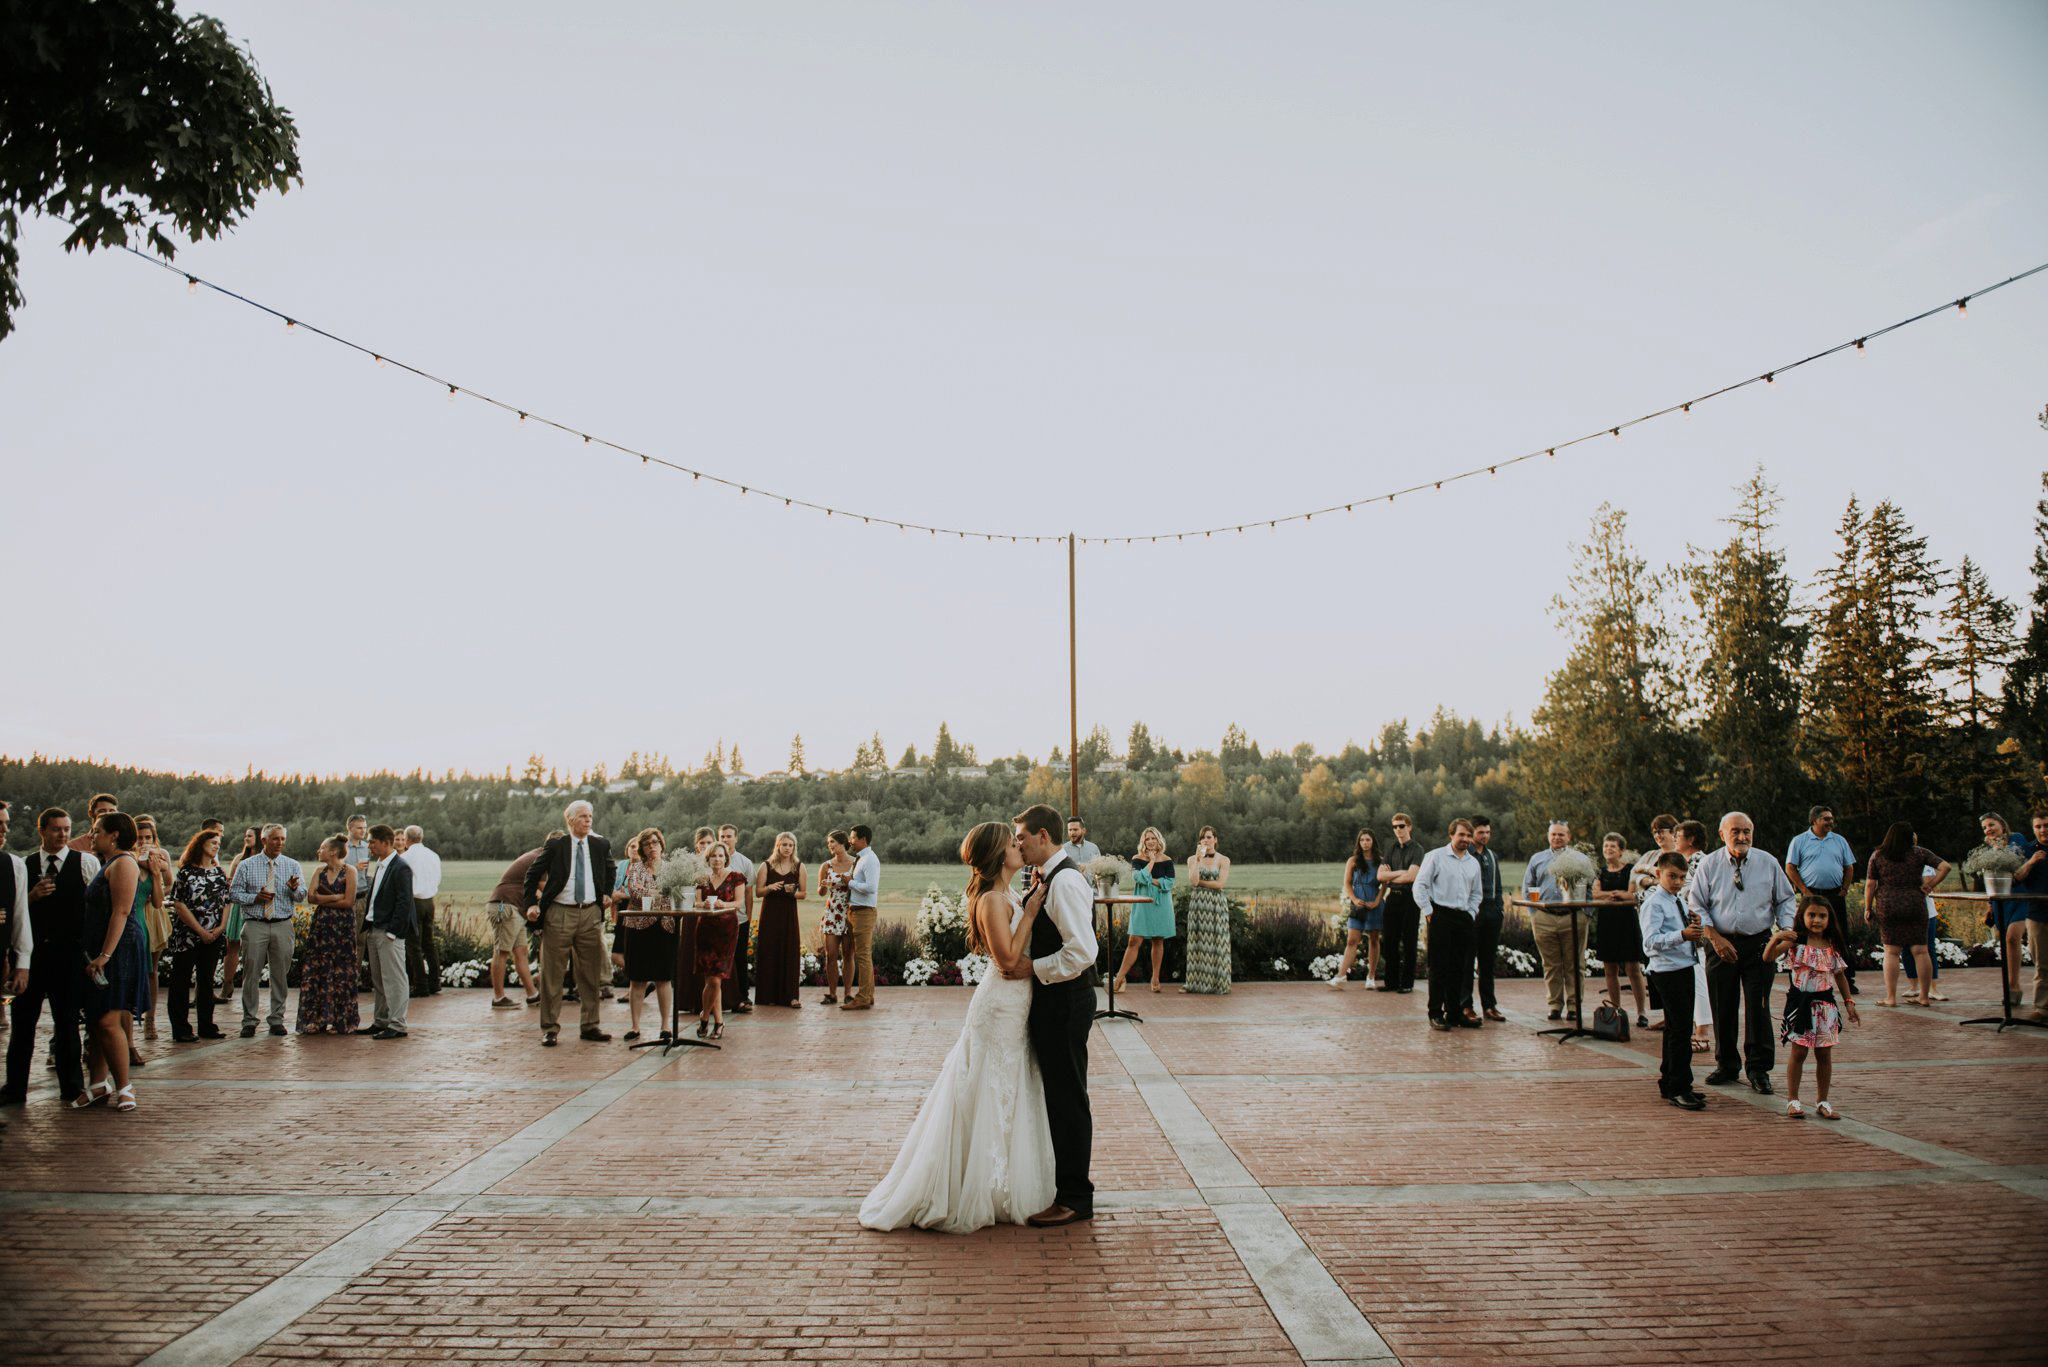 kristen-and-cody-the-kelley-farm-wedding-seattle-photographer-caitlyn-nikula-104.jpg